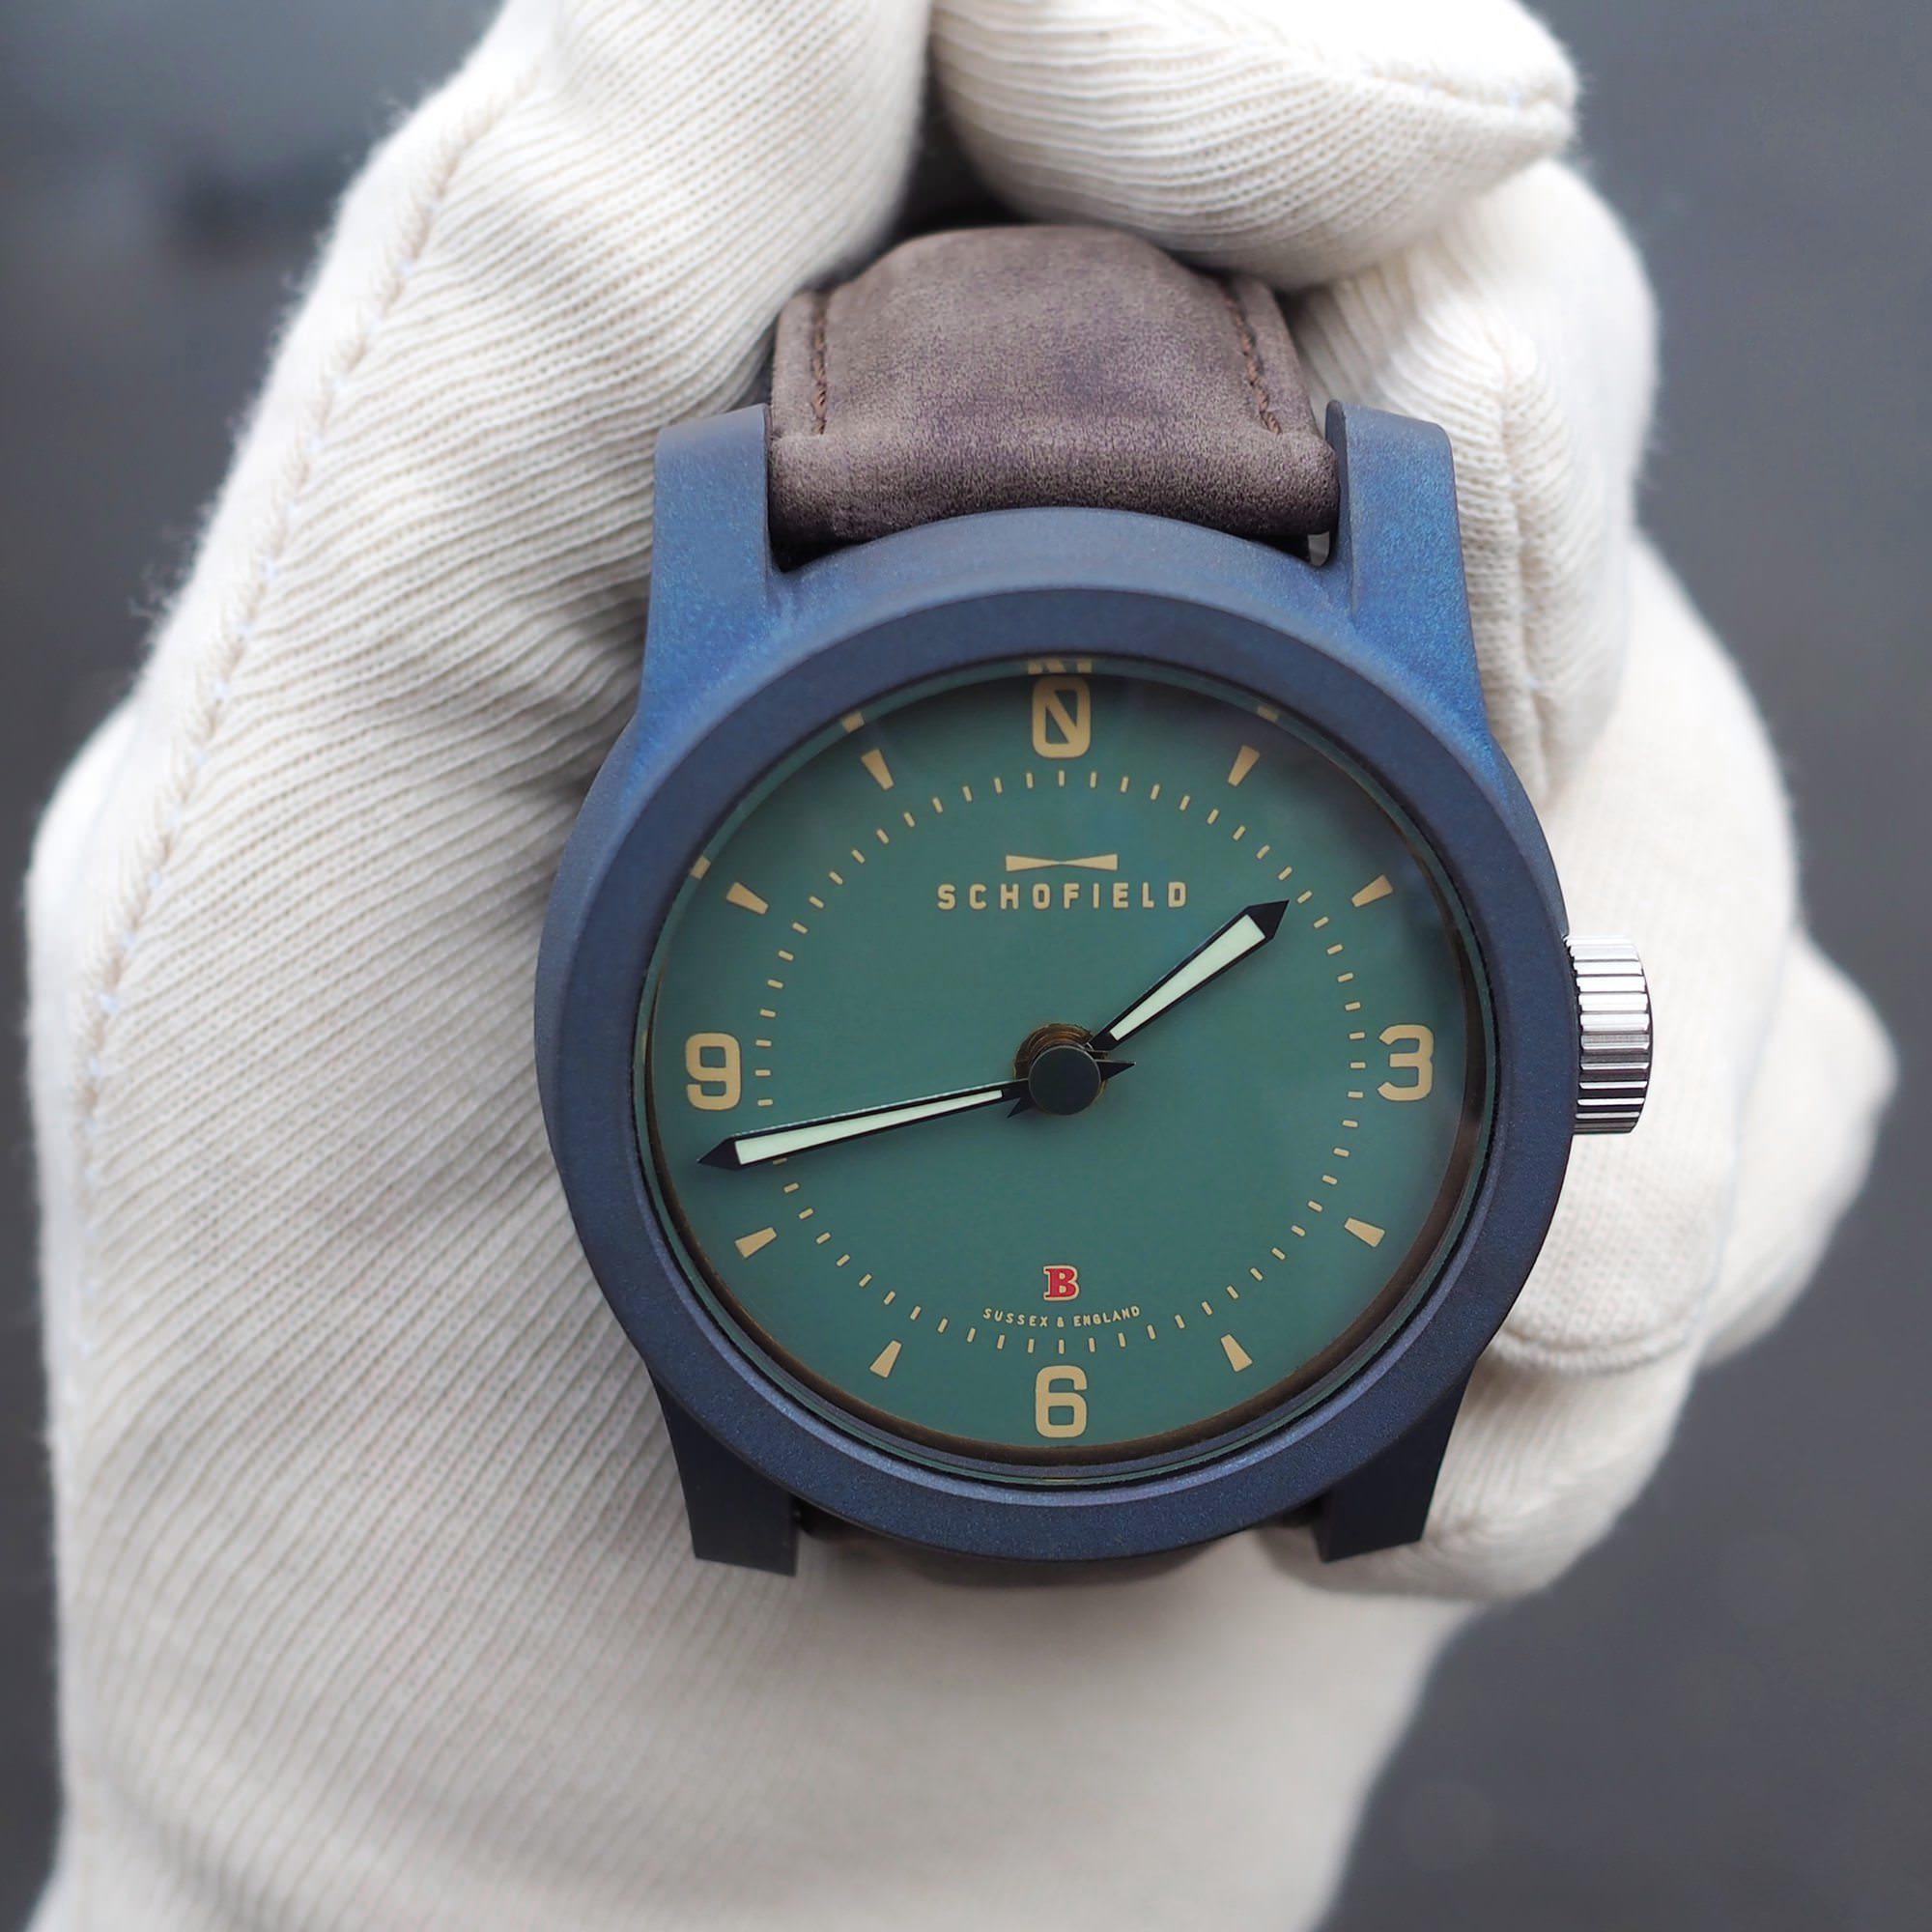 Schofield English made watches- titanium Beater